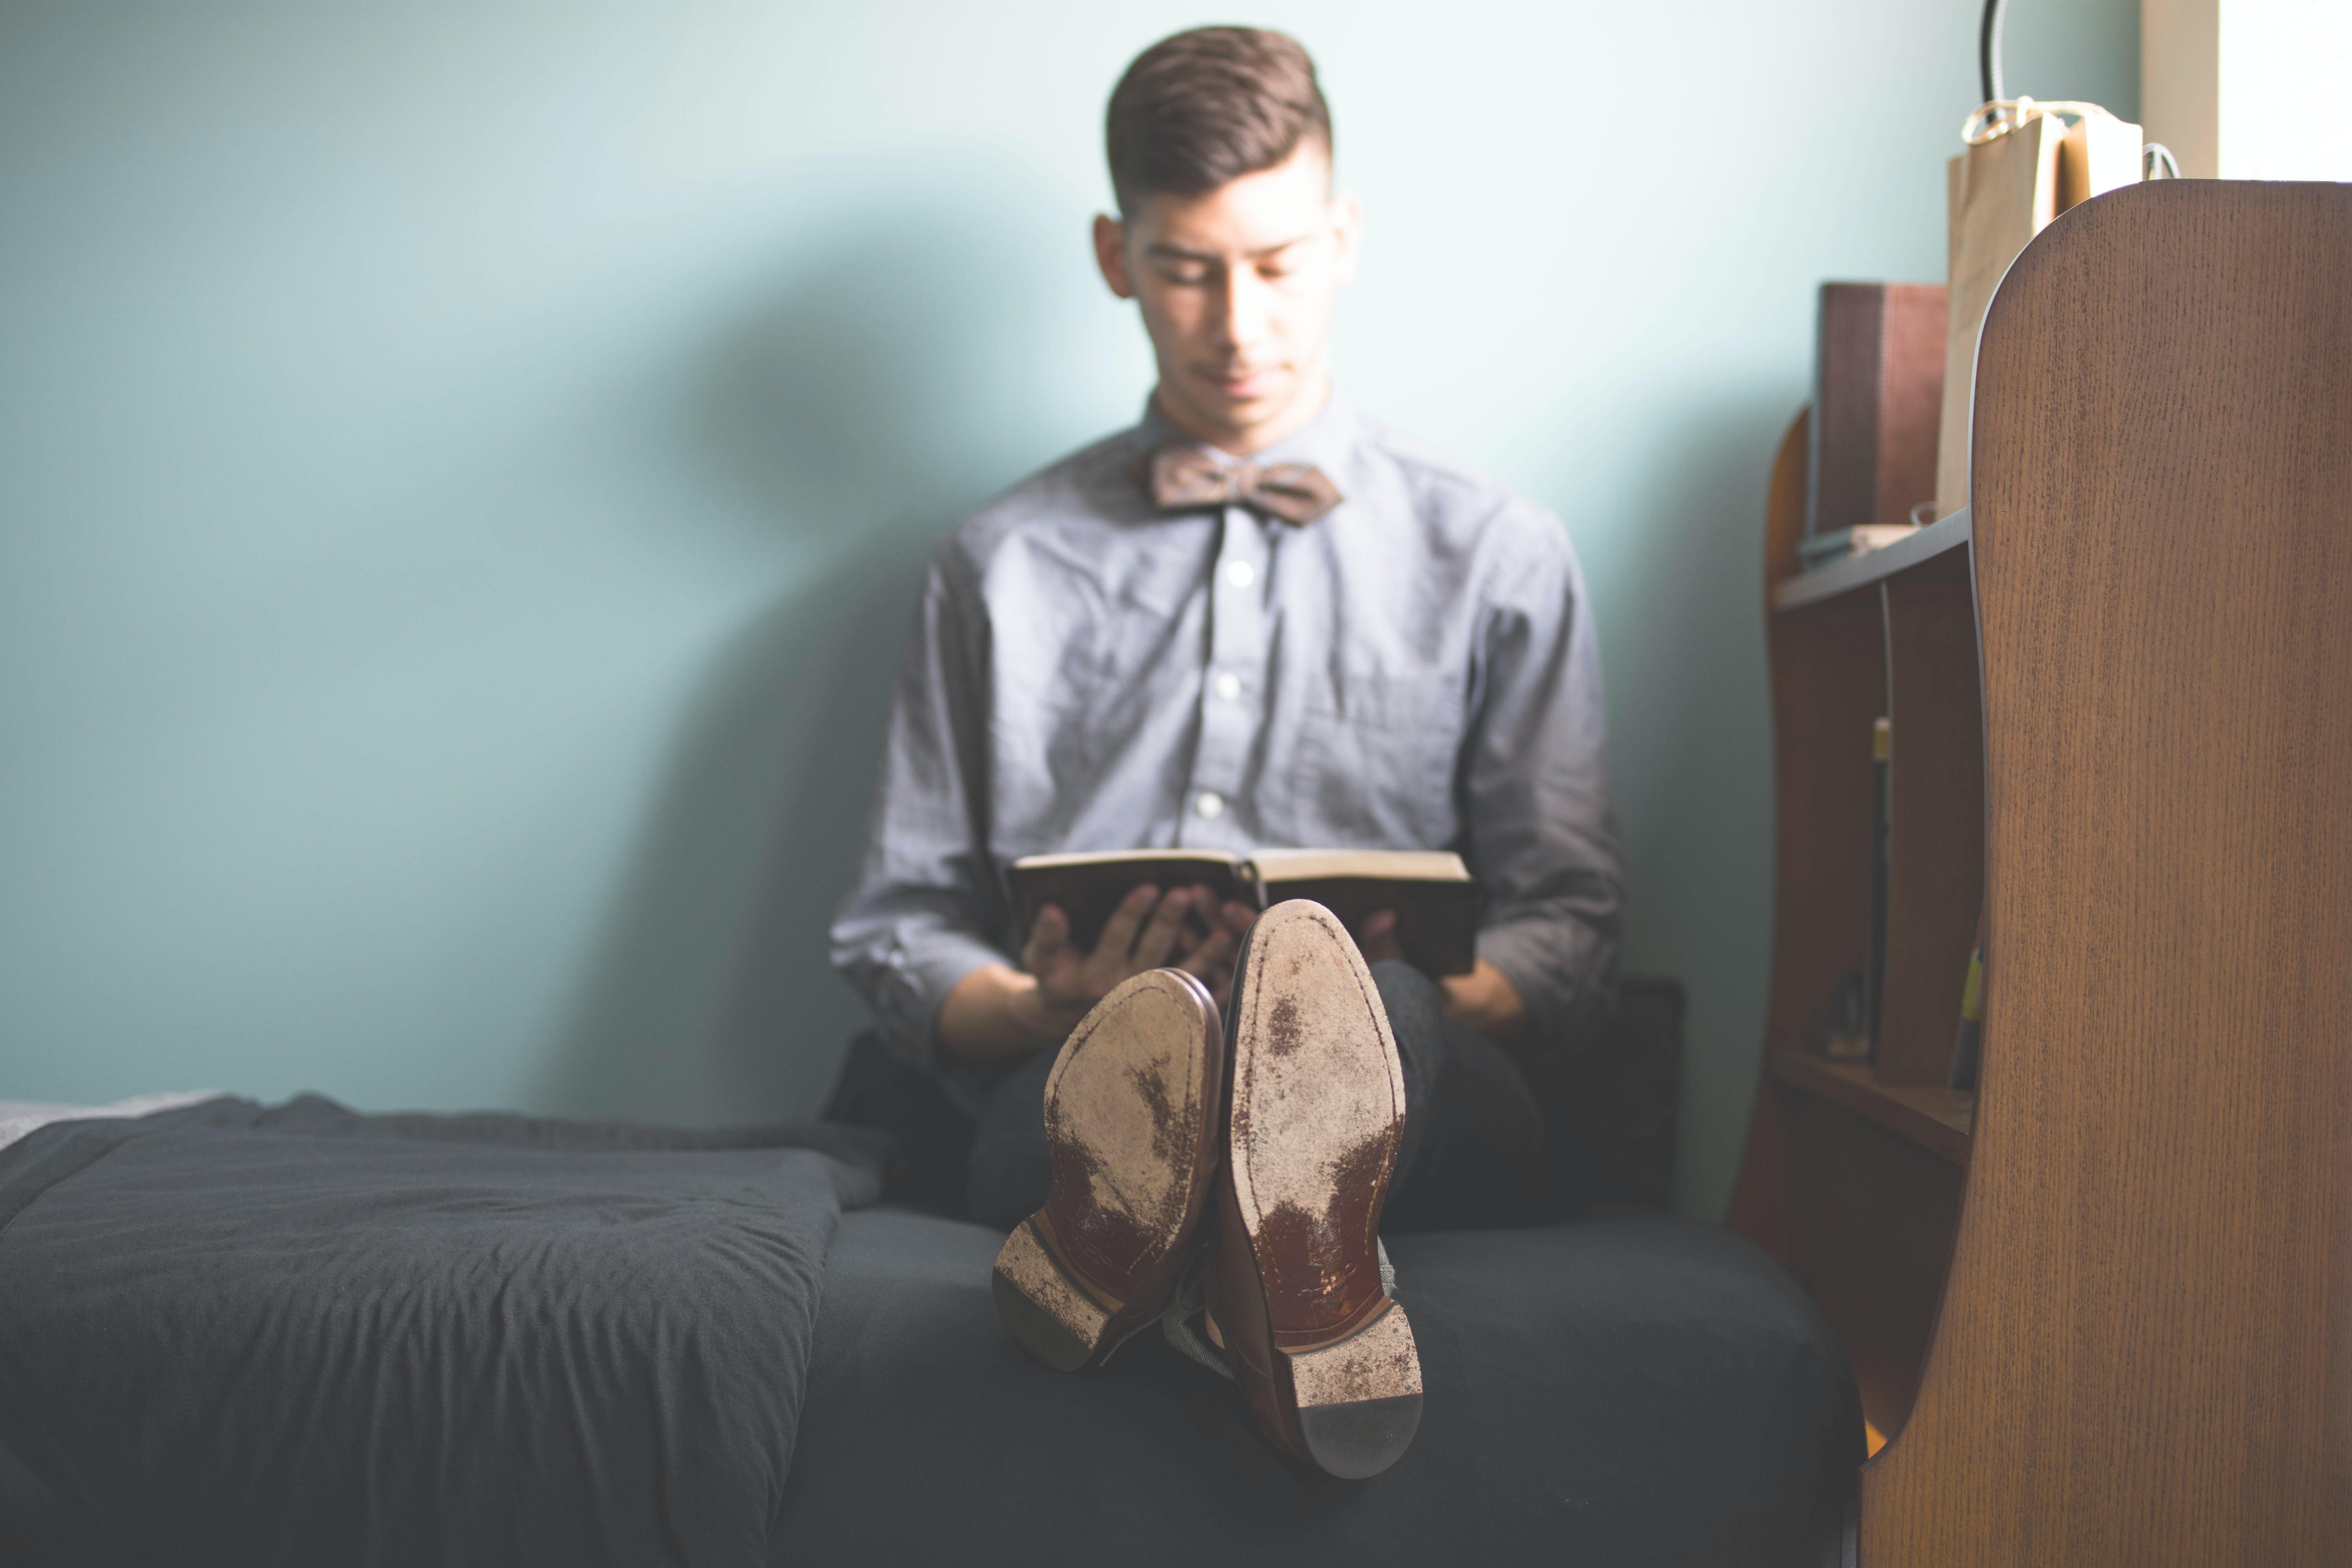 man wearing gray dress shirt reading book